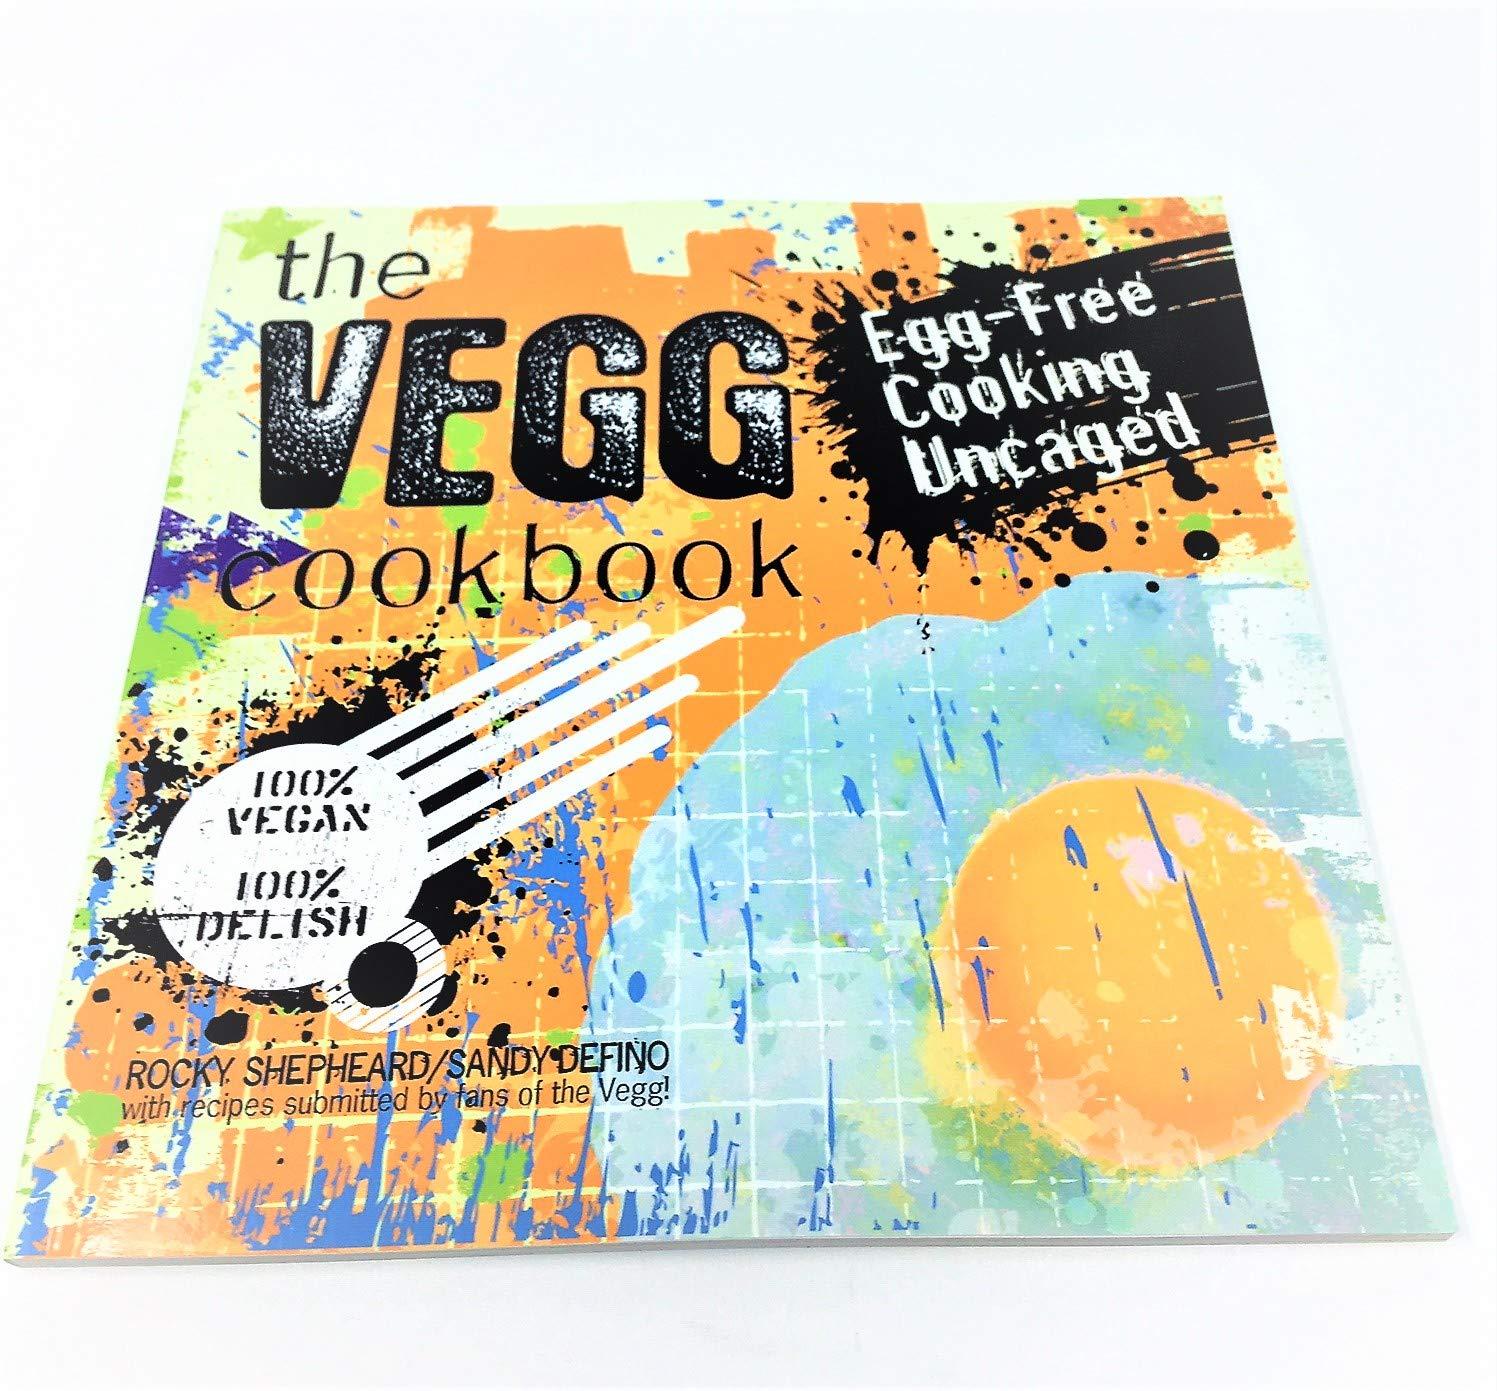 The Vegg Vegan Mega Pack Vegan Egg Yolk + Power Scramble + French Toast Mix + Uncaged Baking Mix + Egg Wisk + Measuring Cups and Spoons + The Vegg Cookbook by The Vegg (Image #2)